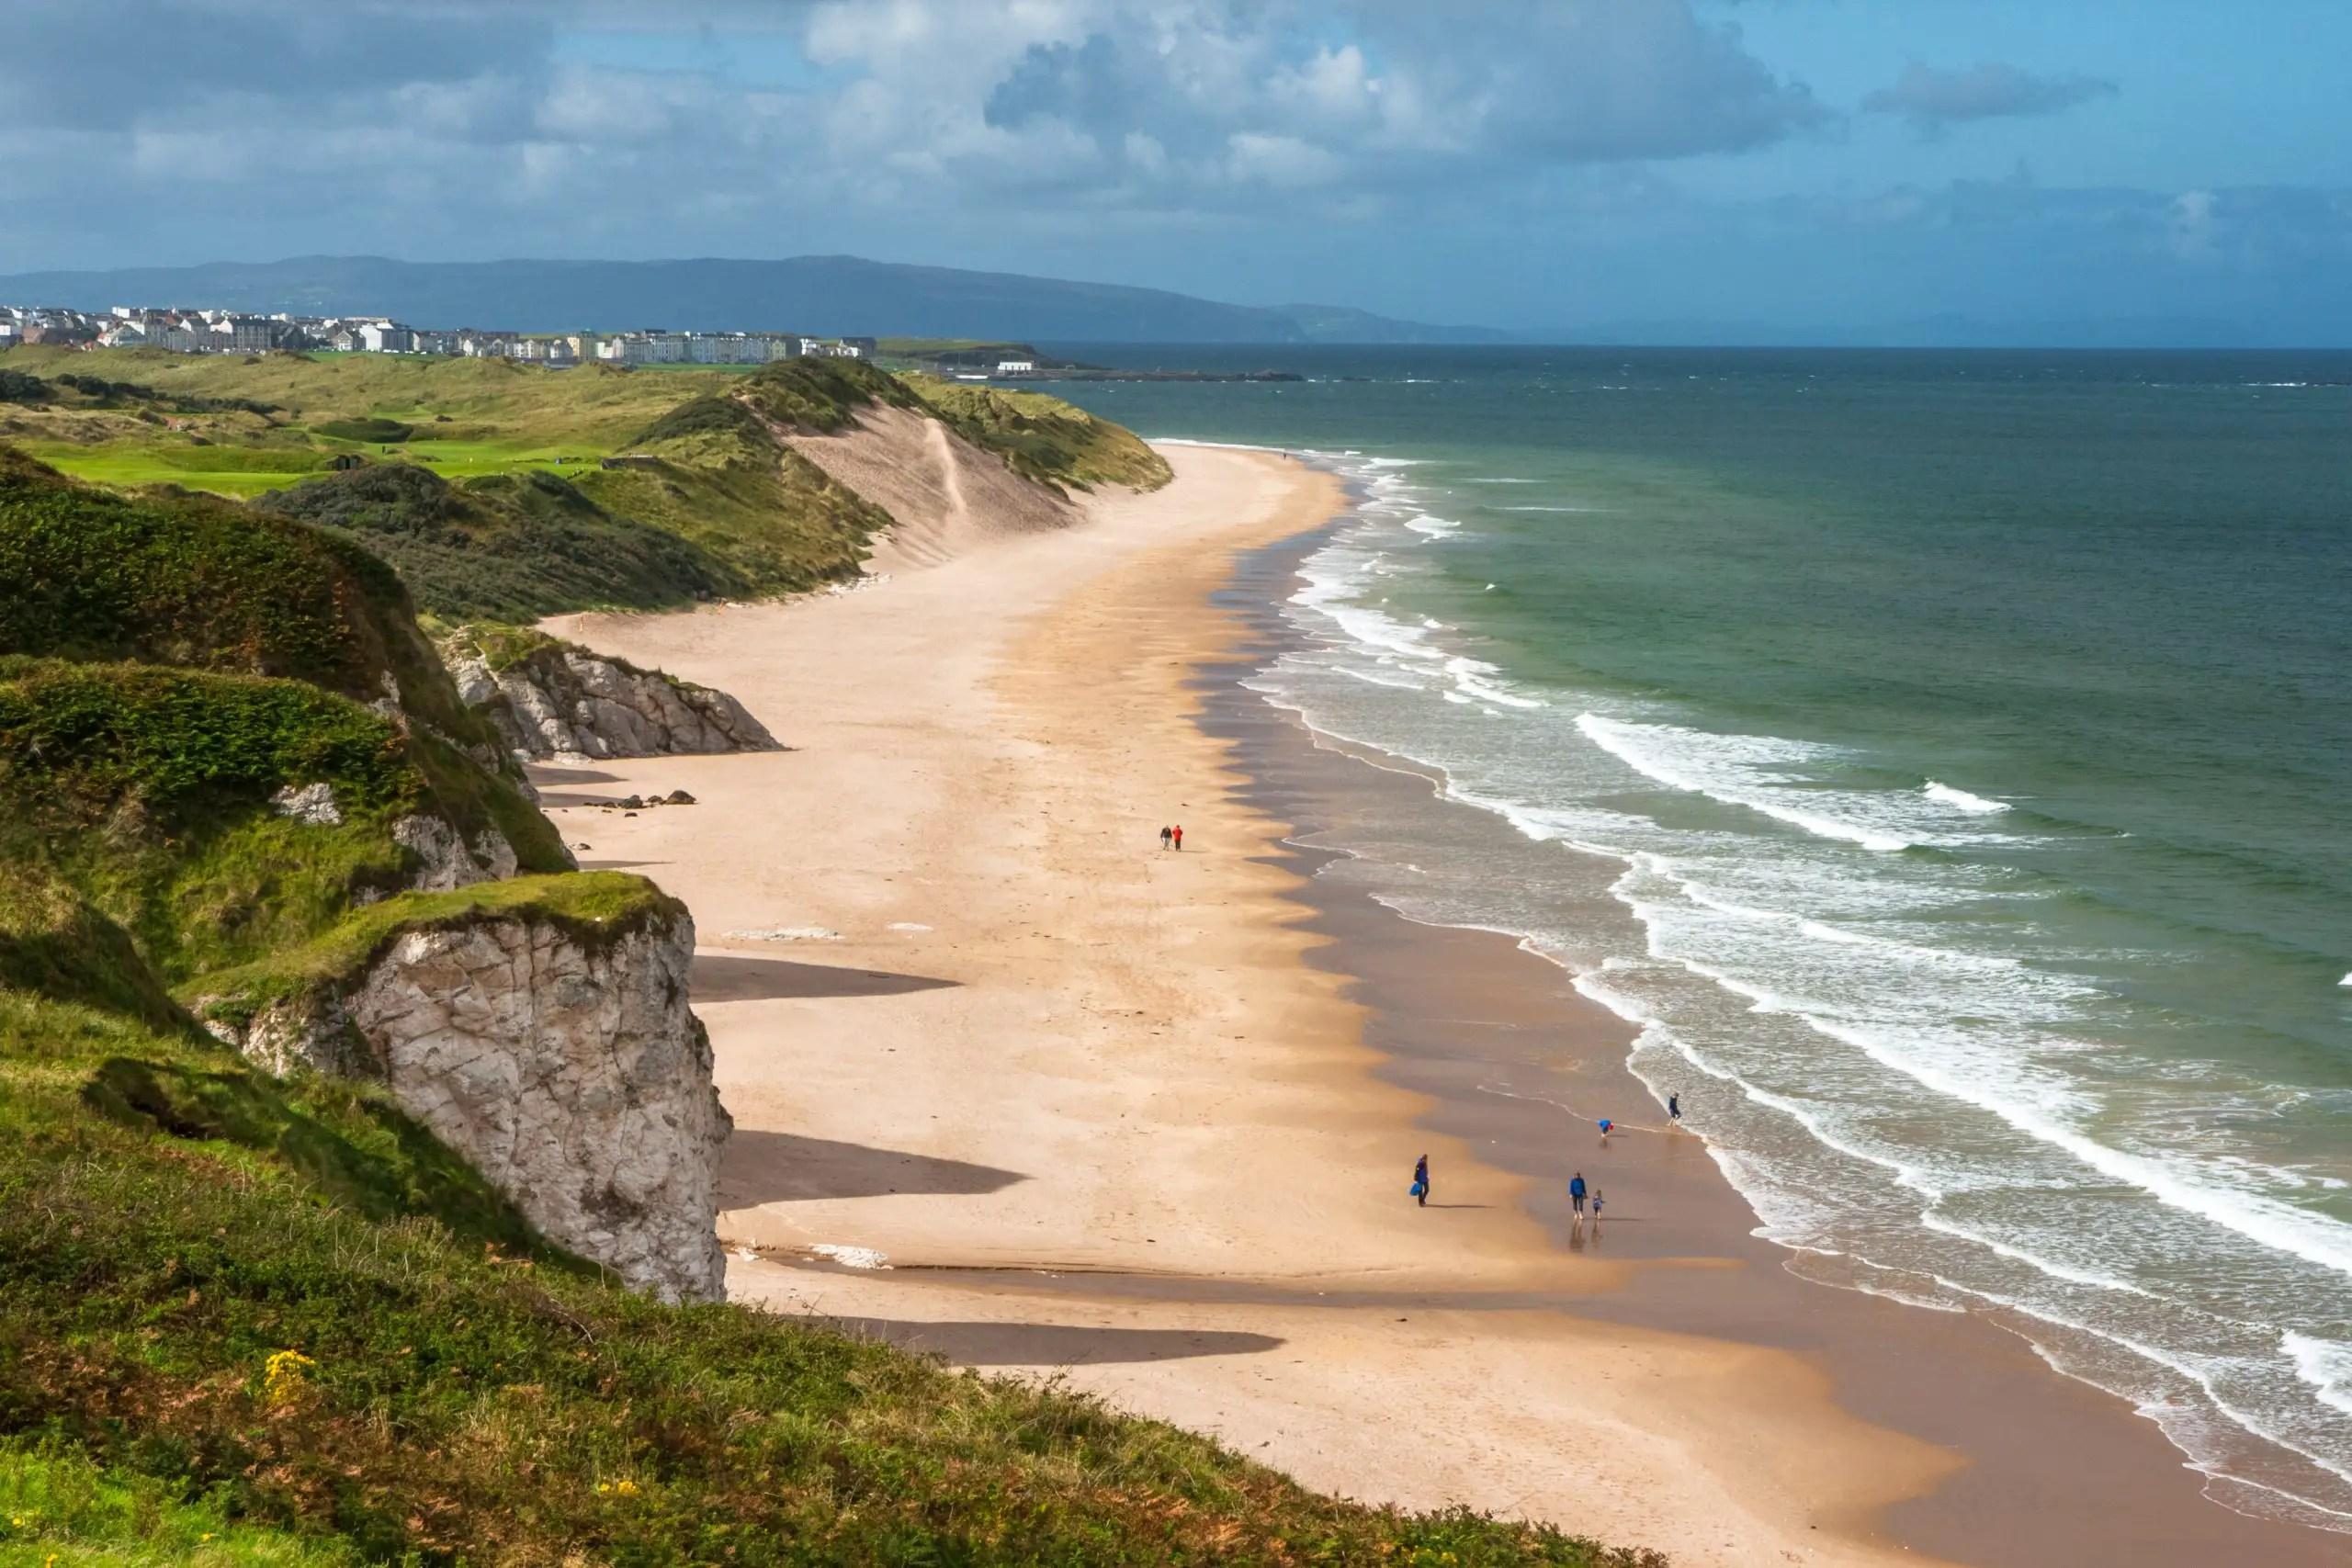 Portrush seaside resort town in Northern Ireland